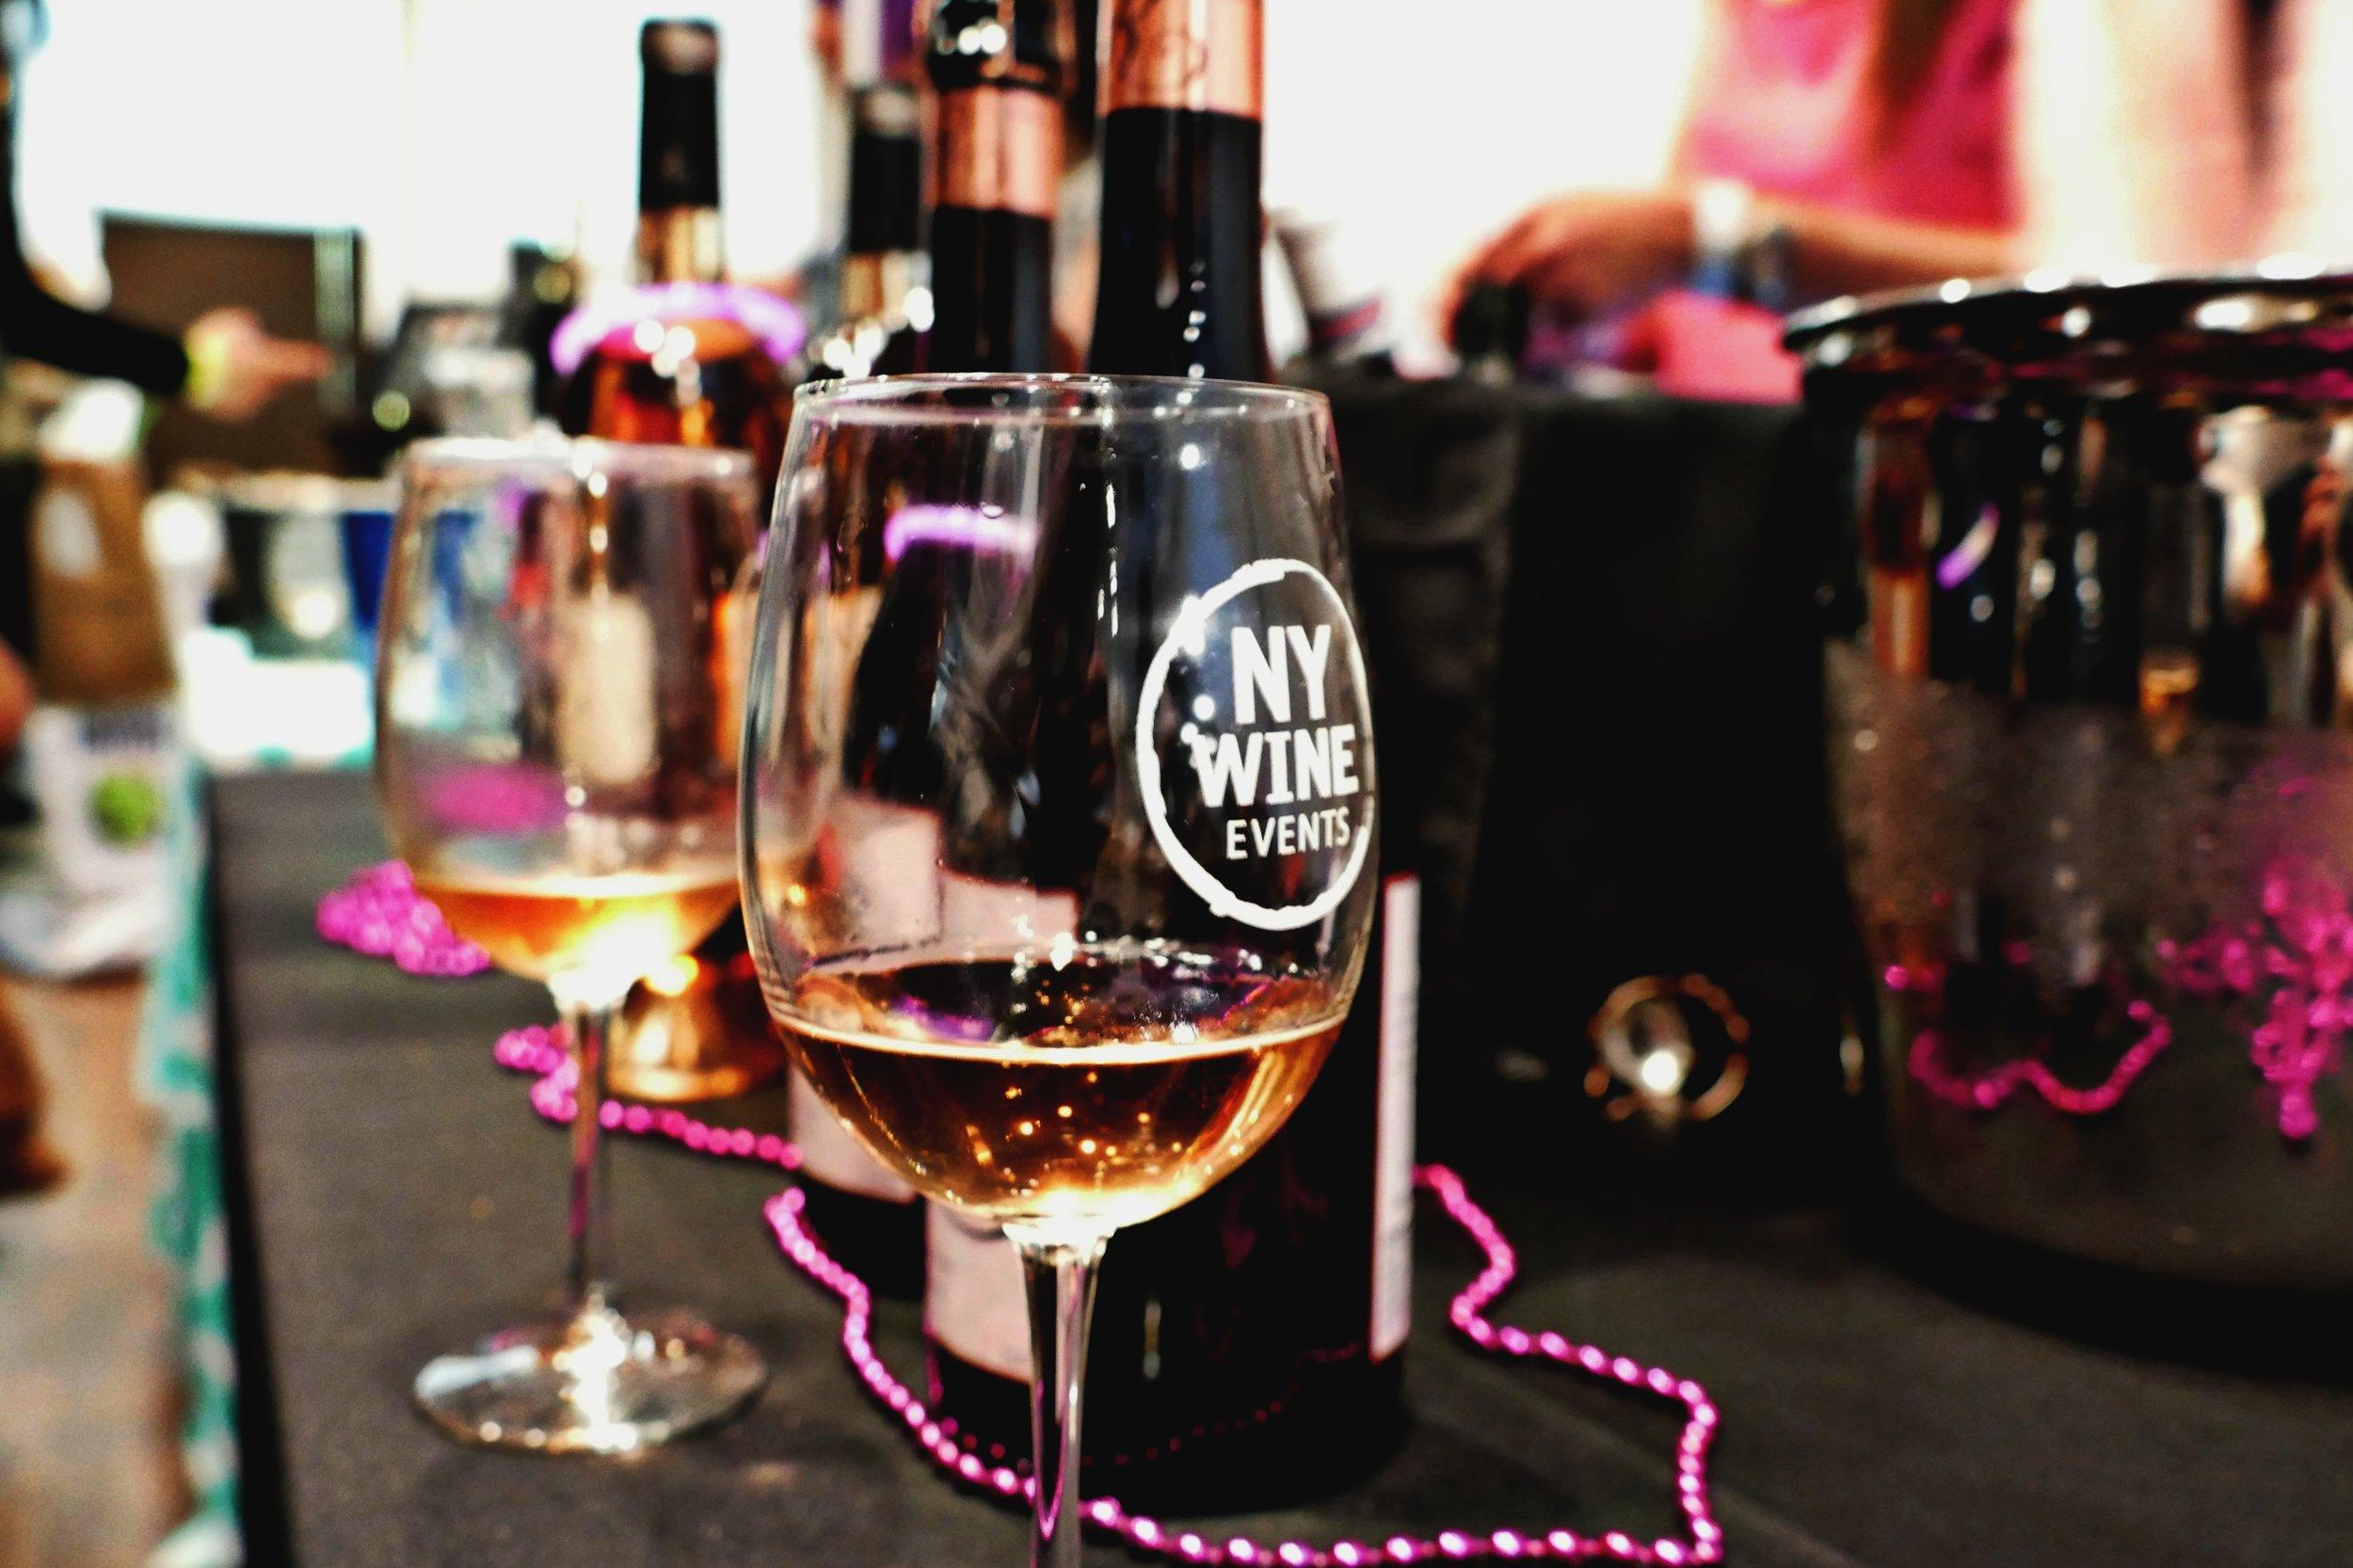 Brotherhood Winery, America's oldest winery